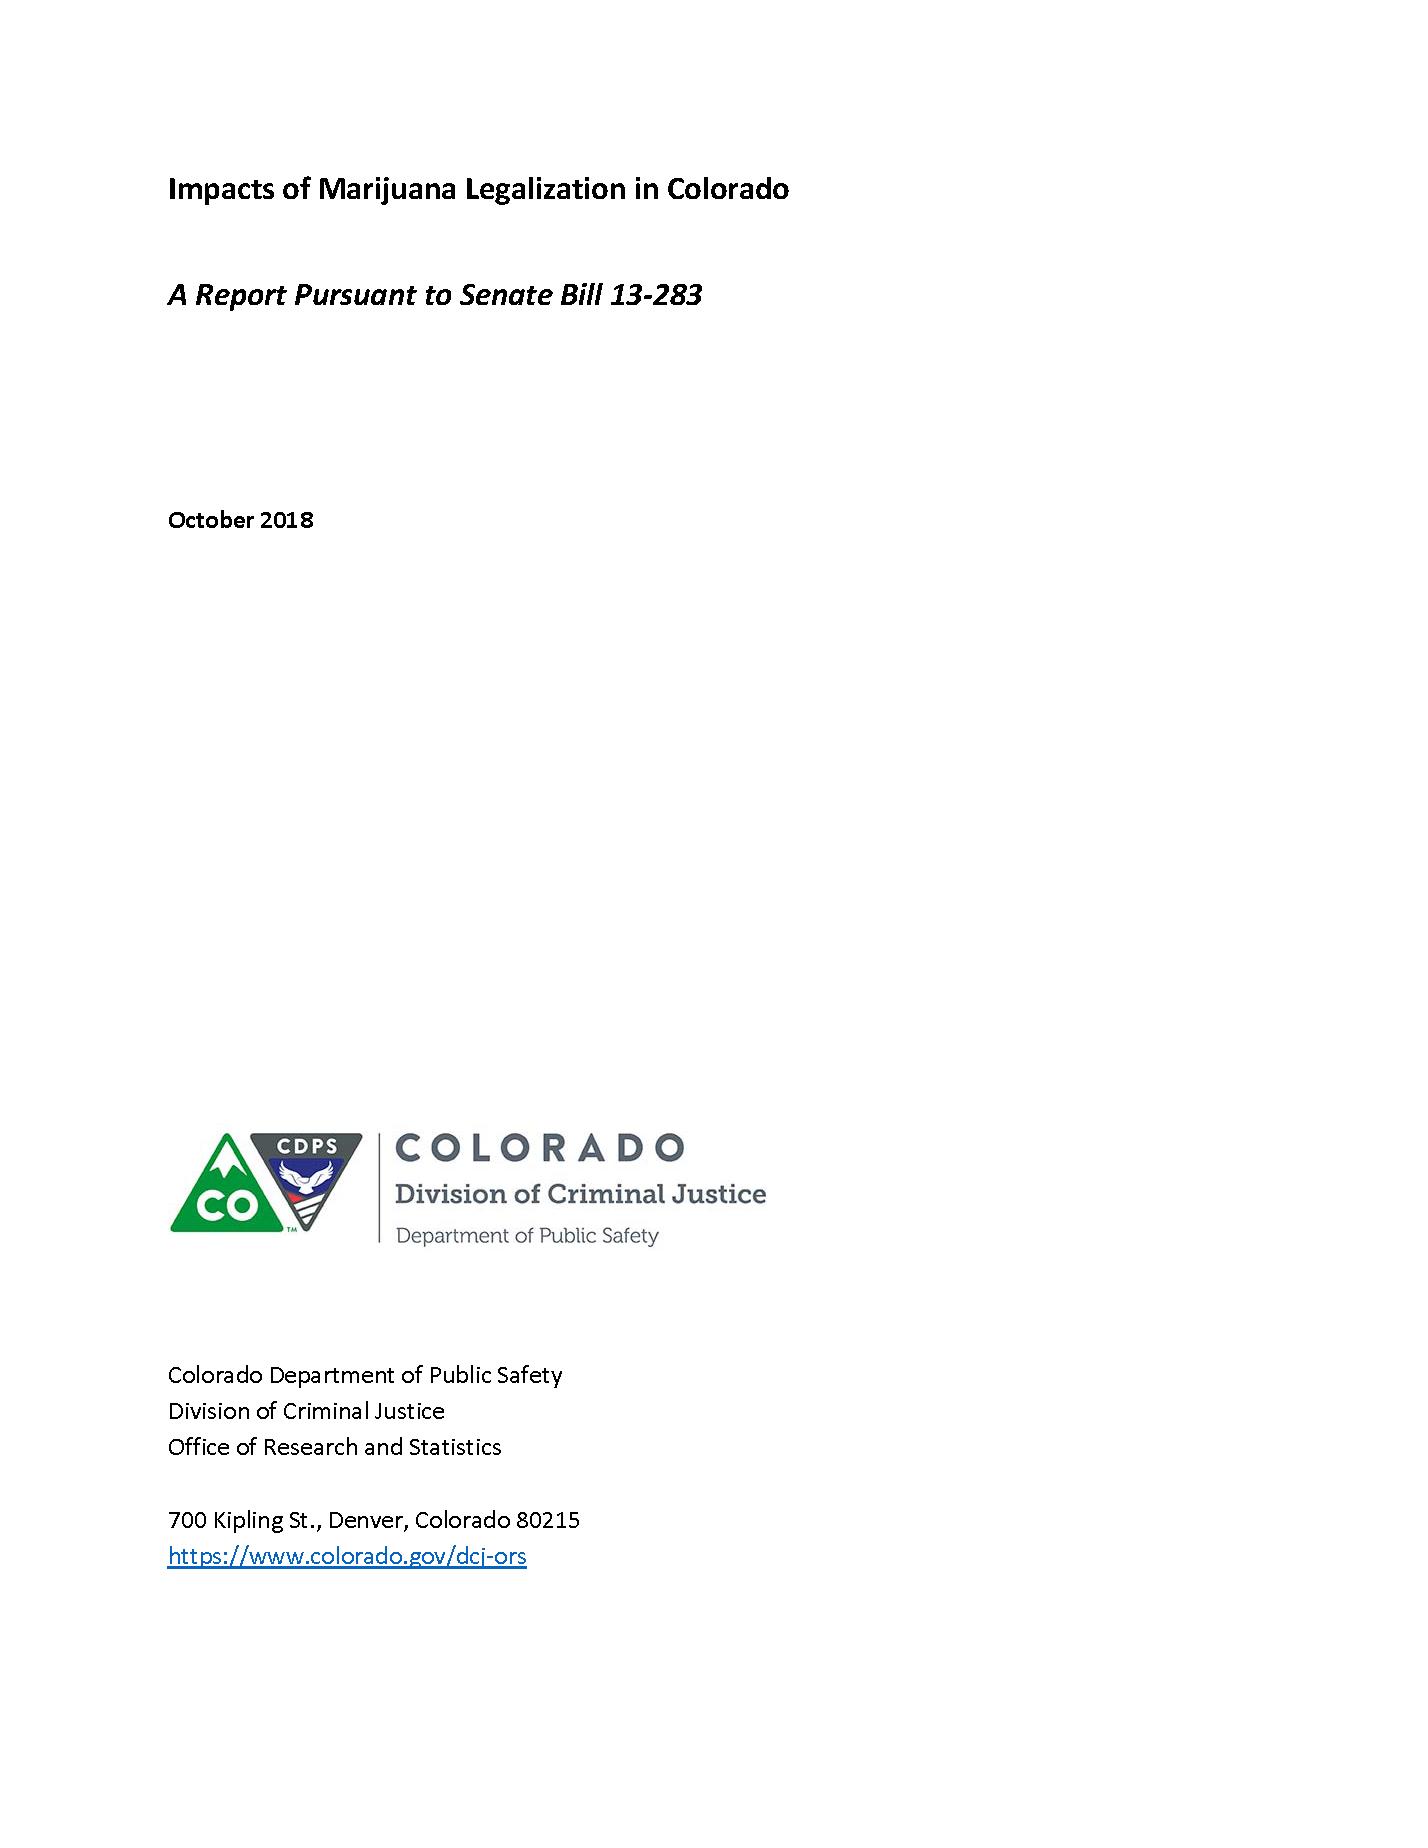 Impacts of Marijuana Legalization in Colorado (October 2018)